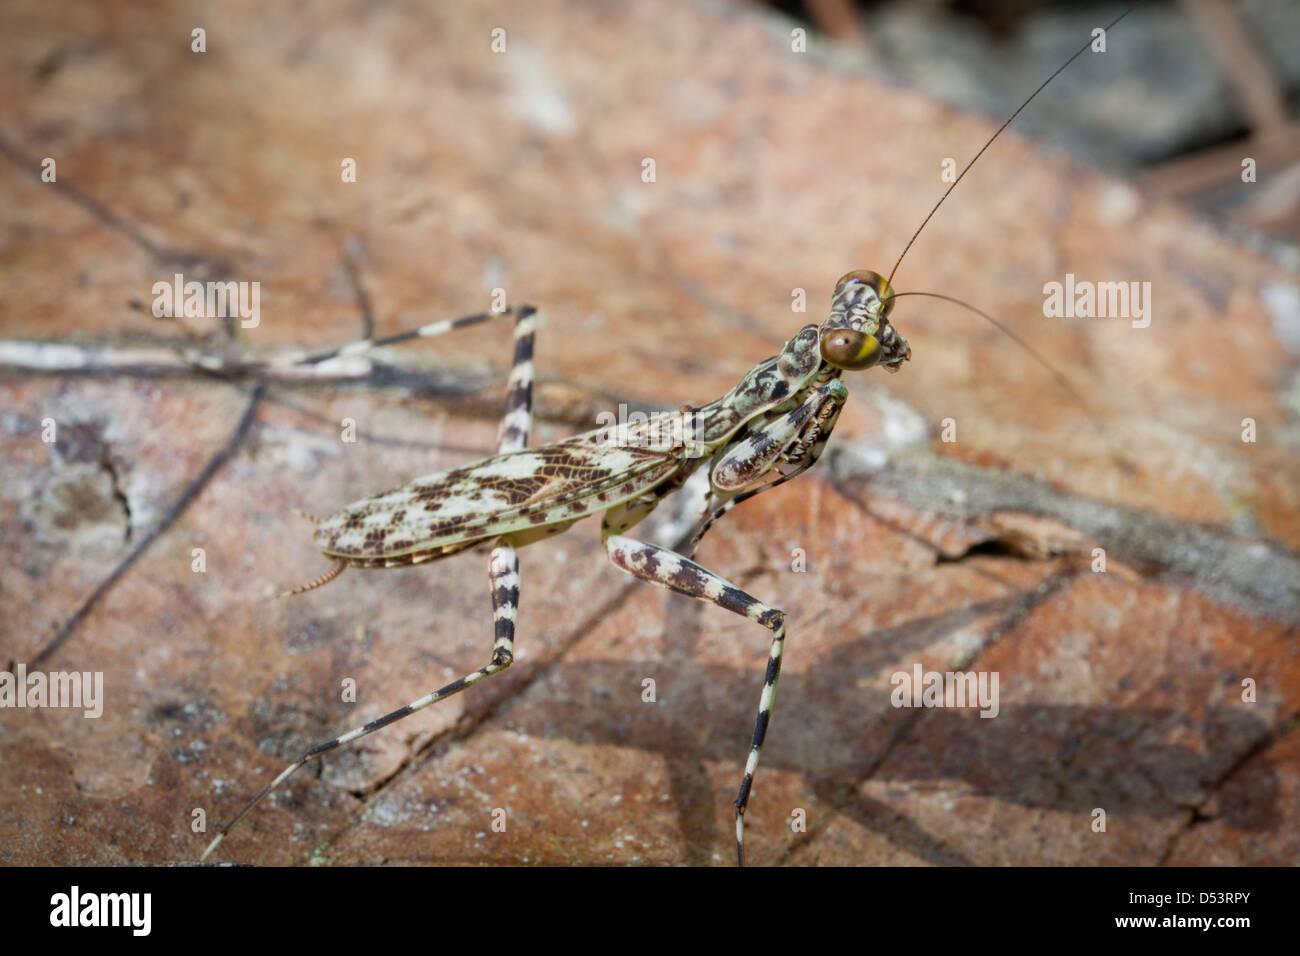 Mantis insect in the rainforest of Altos de Campana national park, Panama province, Republic of Panama. - Stock Image